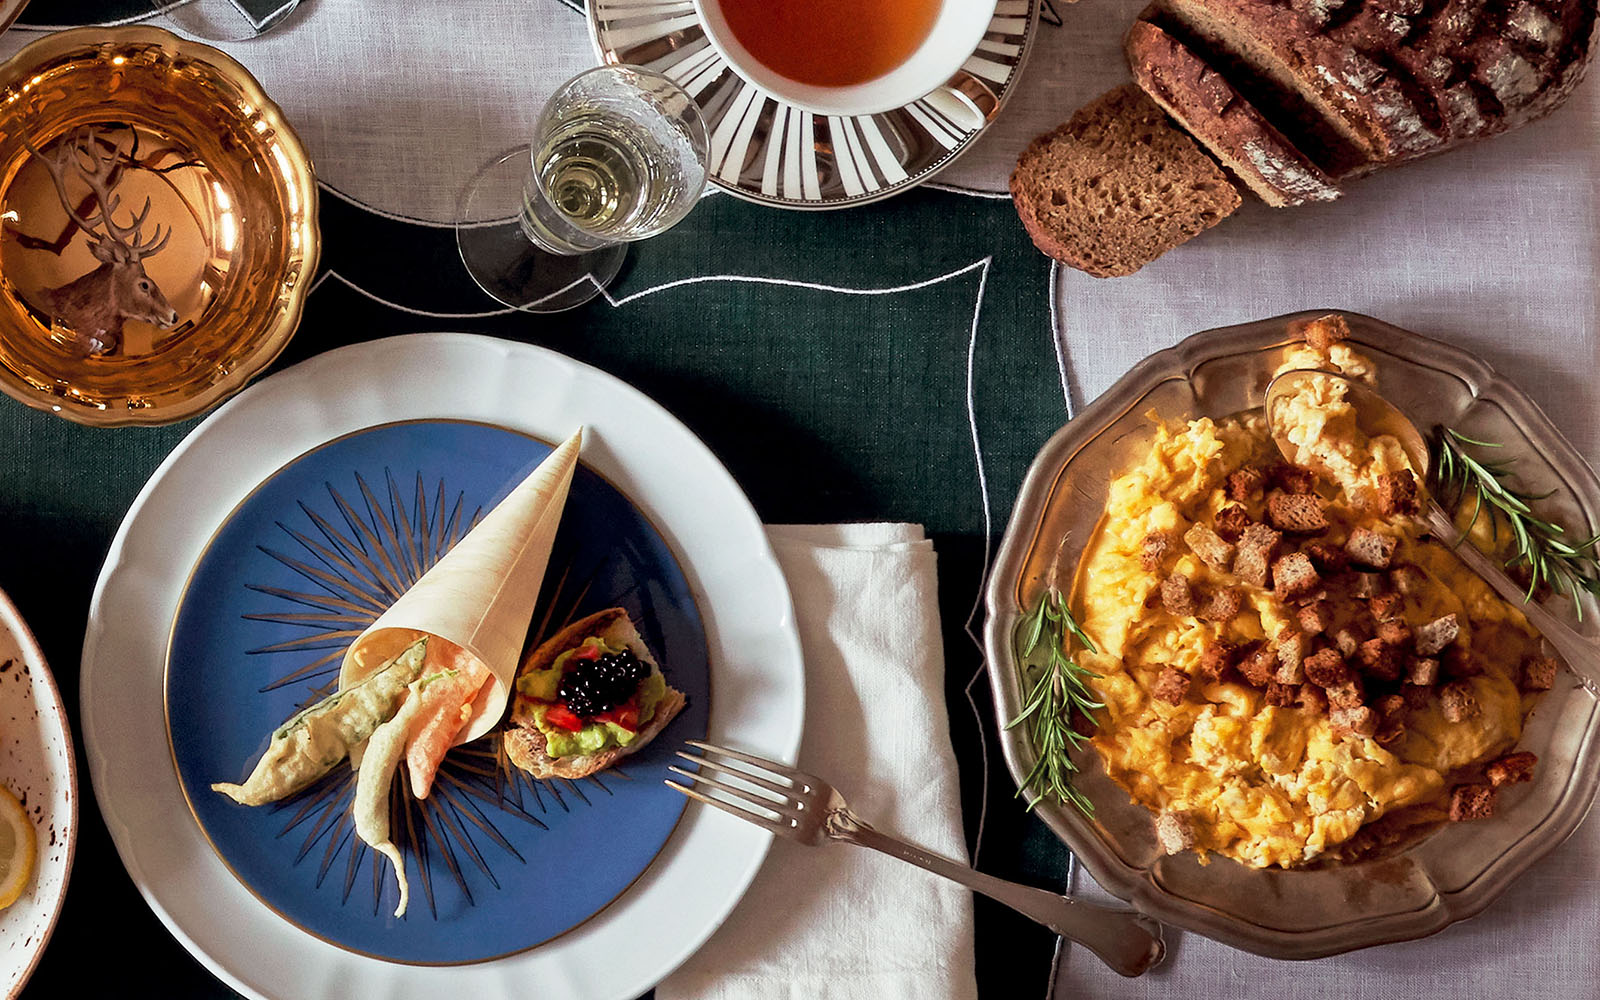 Recipe Scrambled eggs and black bread